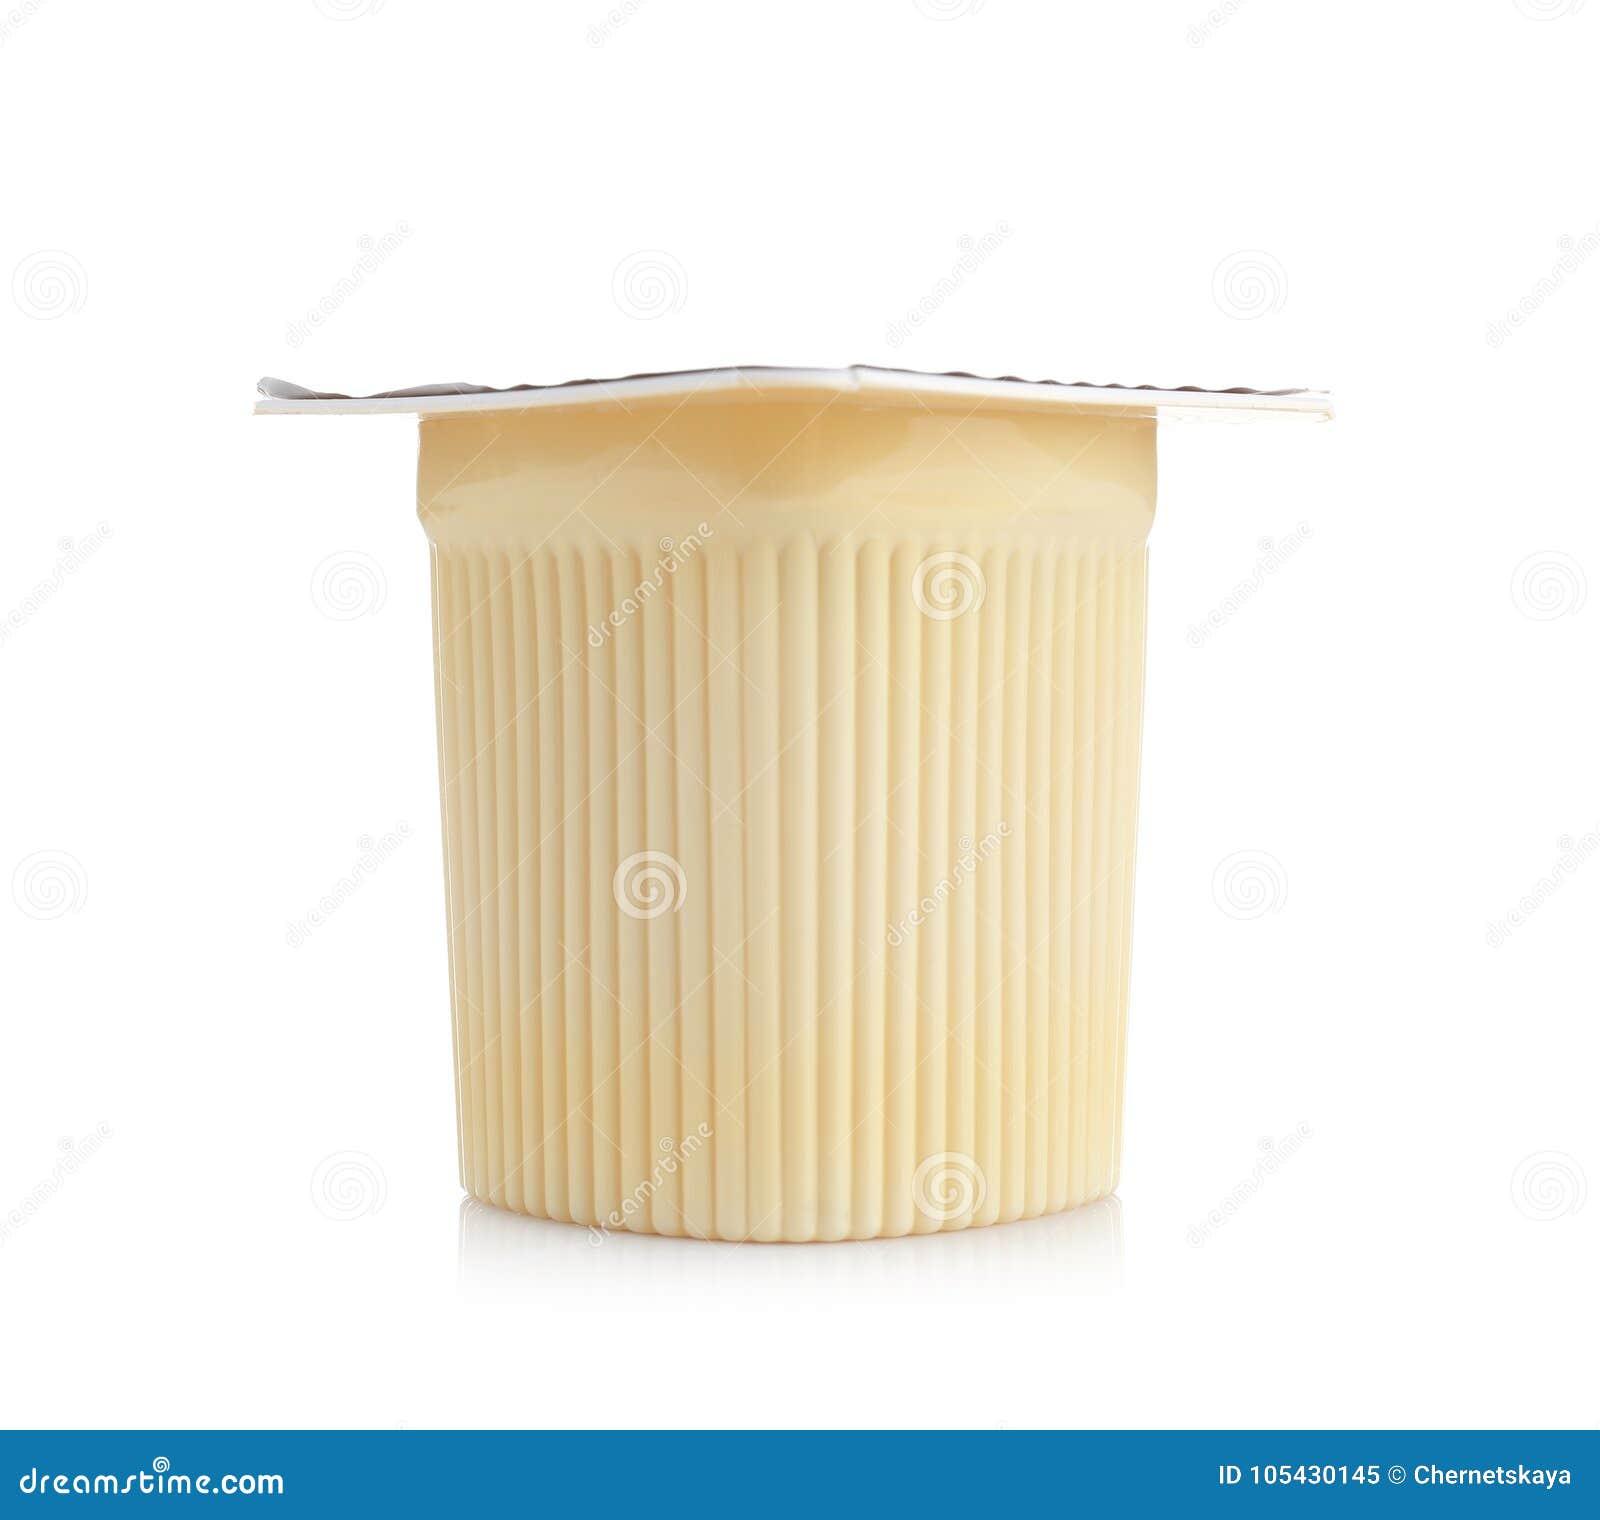 Plastic cup with yogurt